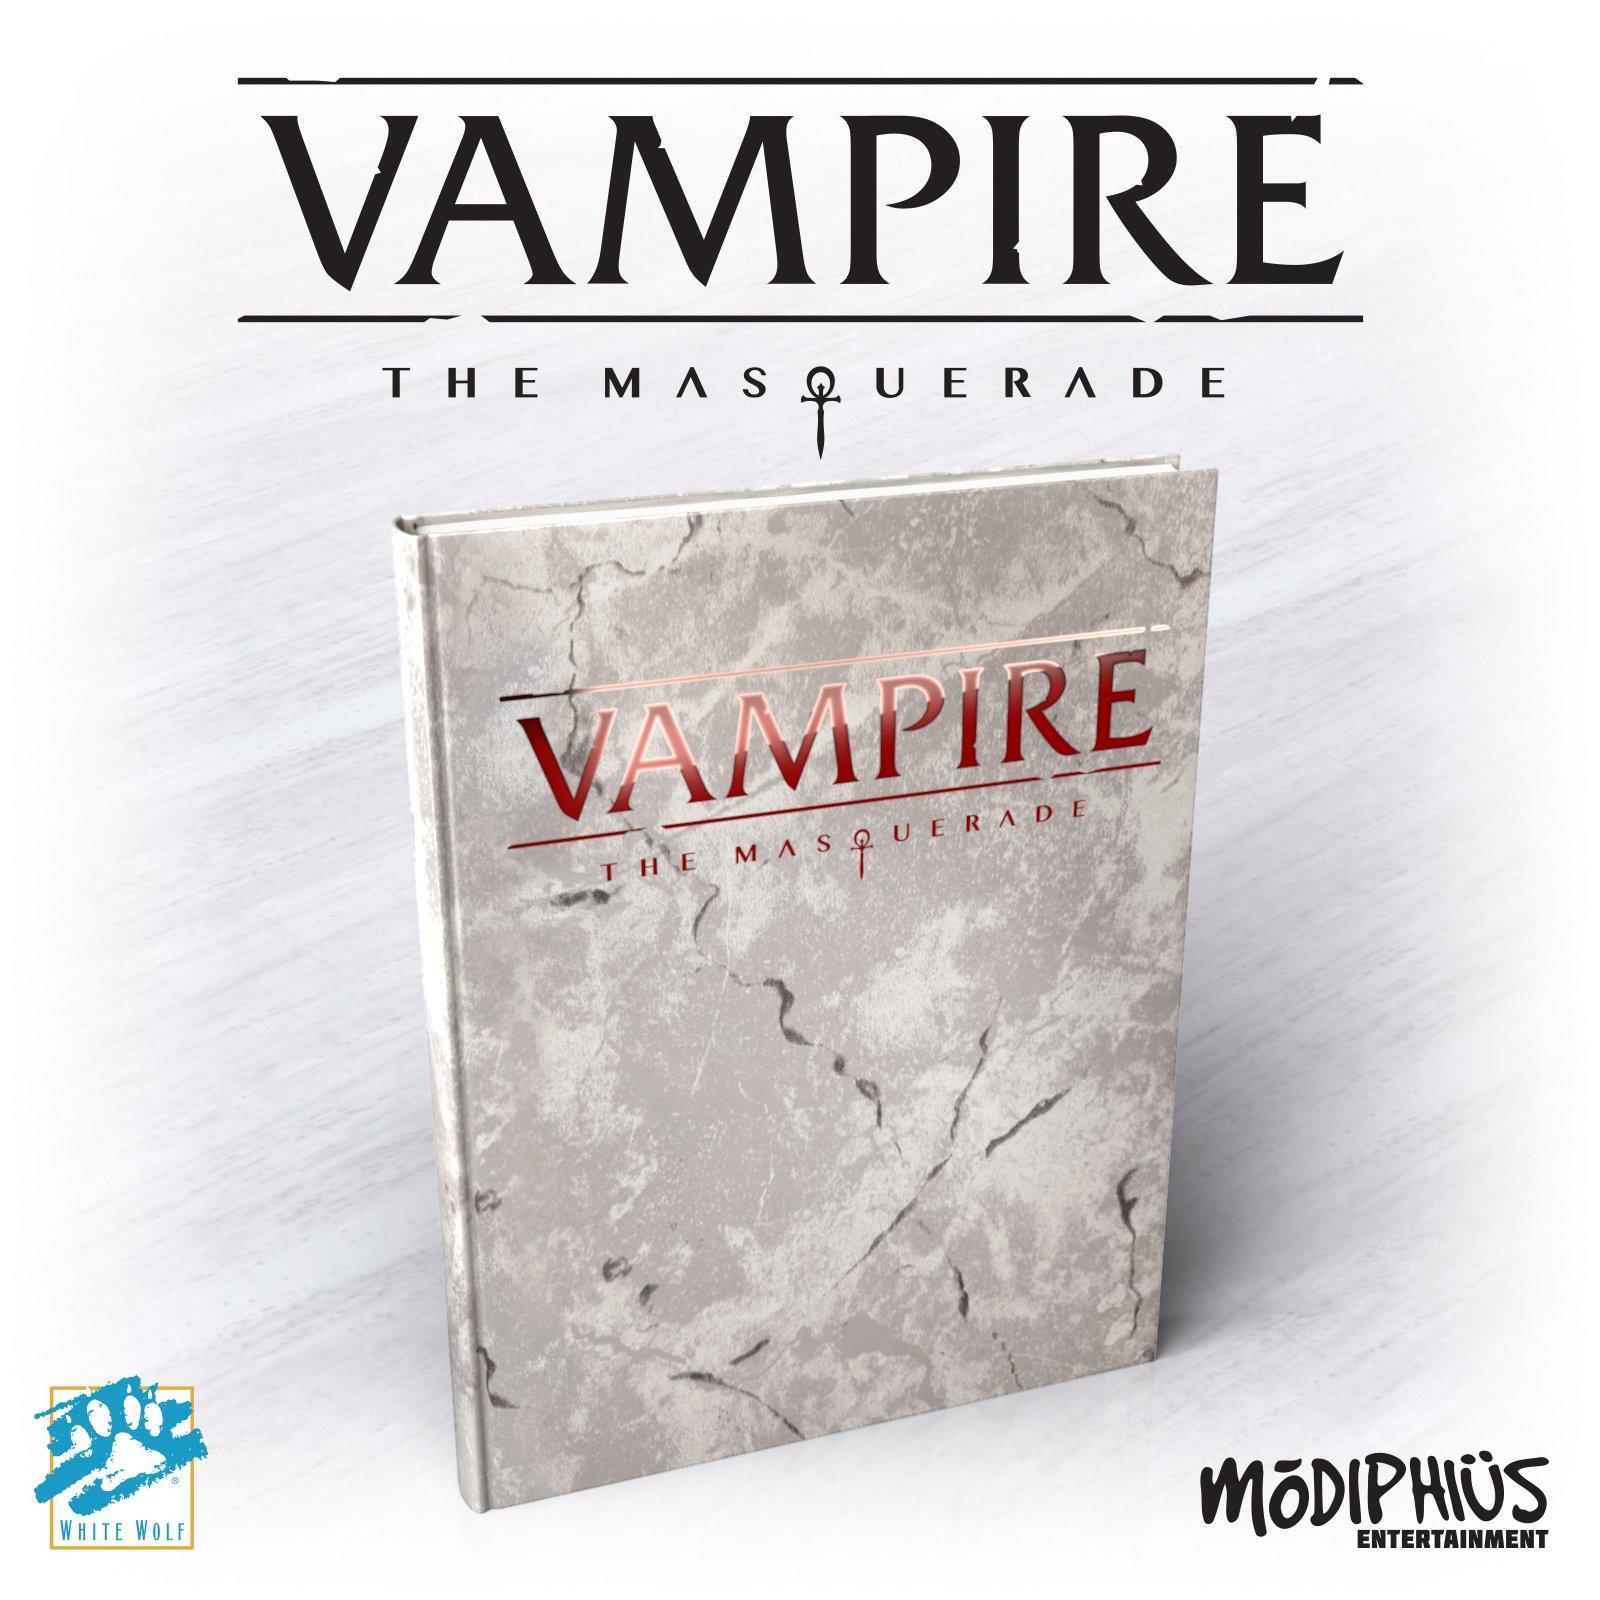 Vampire The Masquerade 5th Edition Alternate Art Edition.